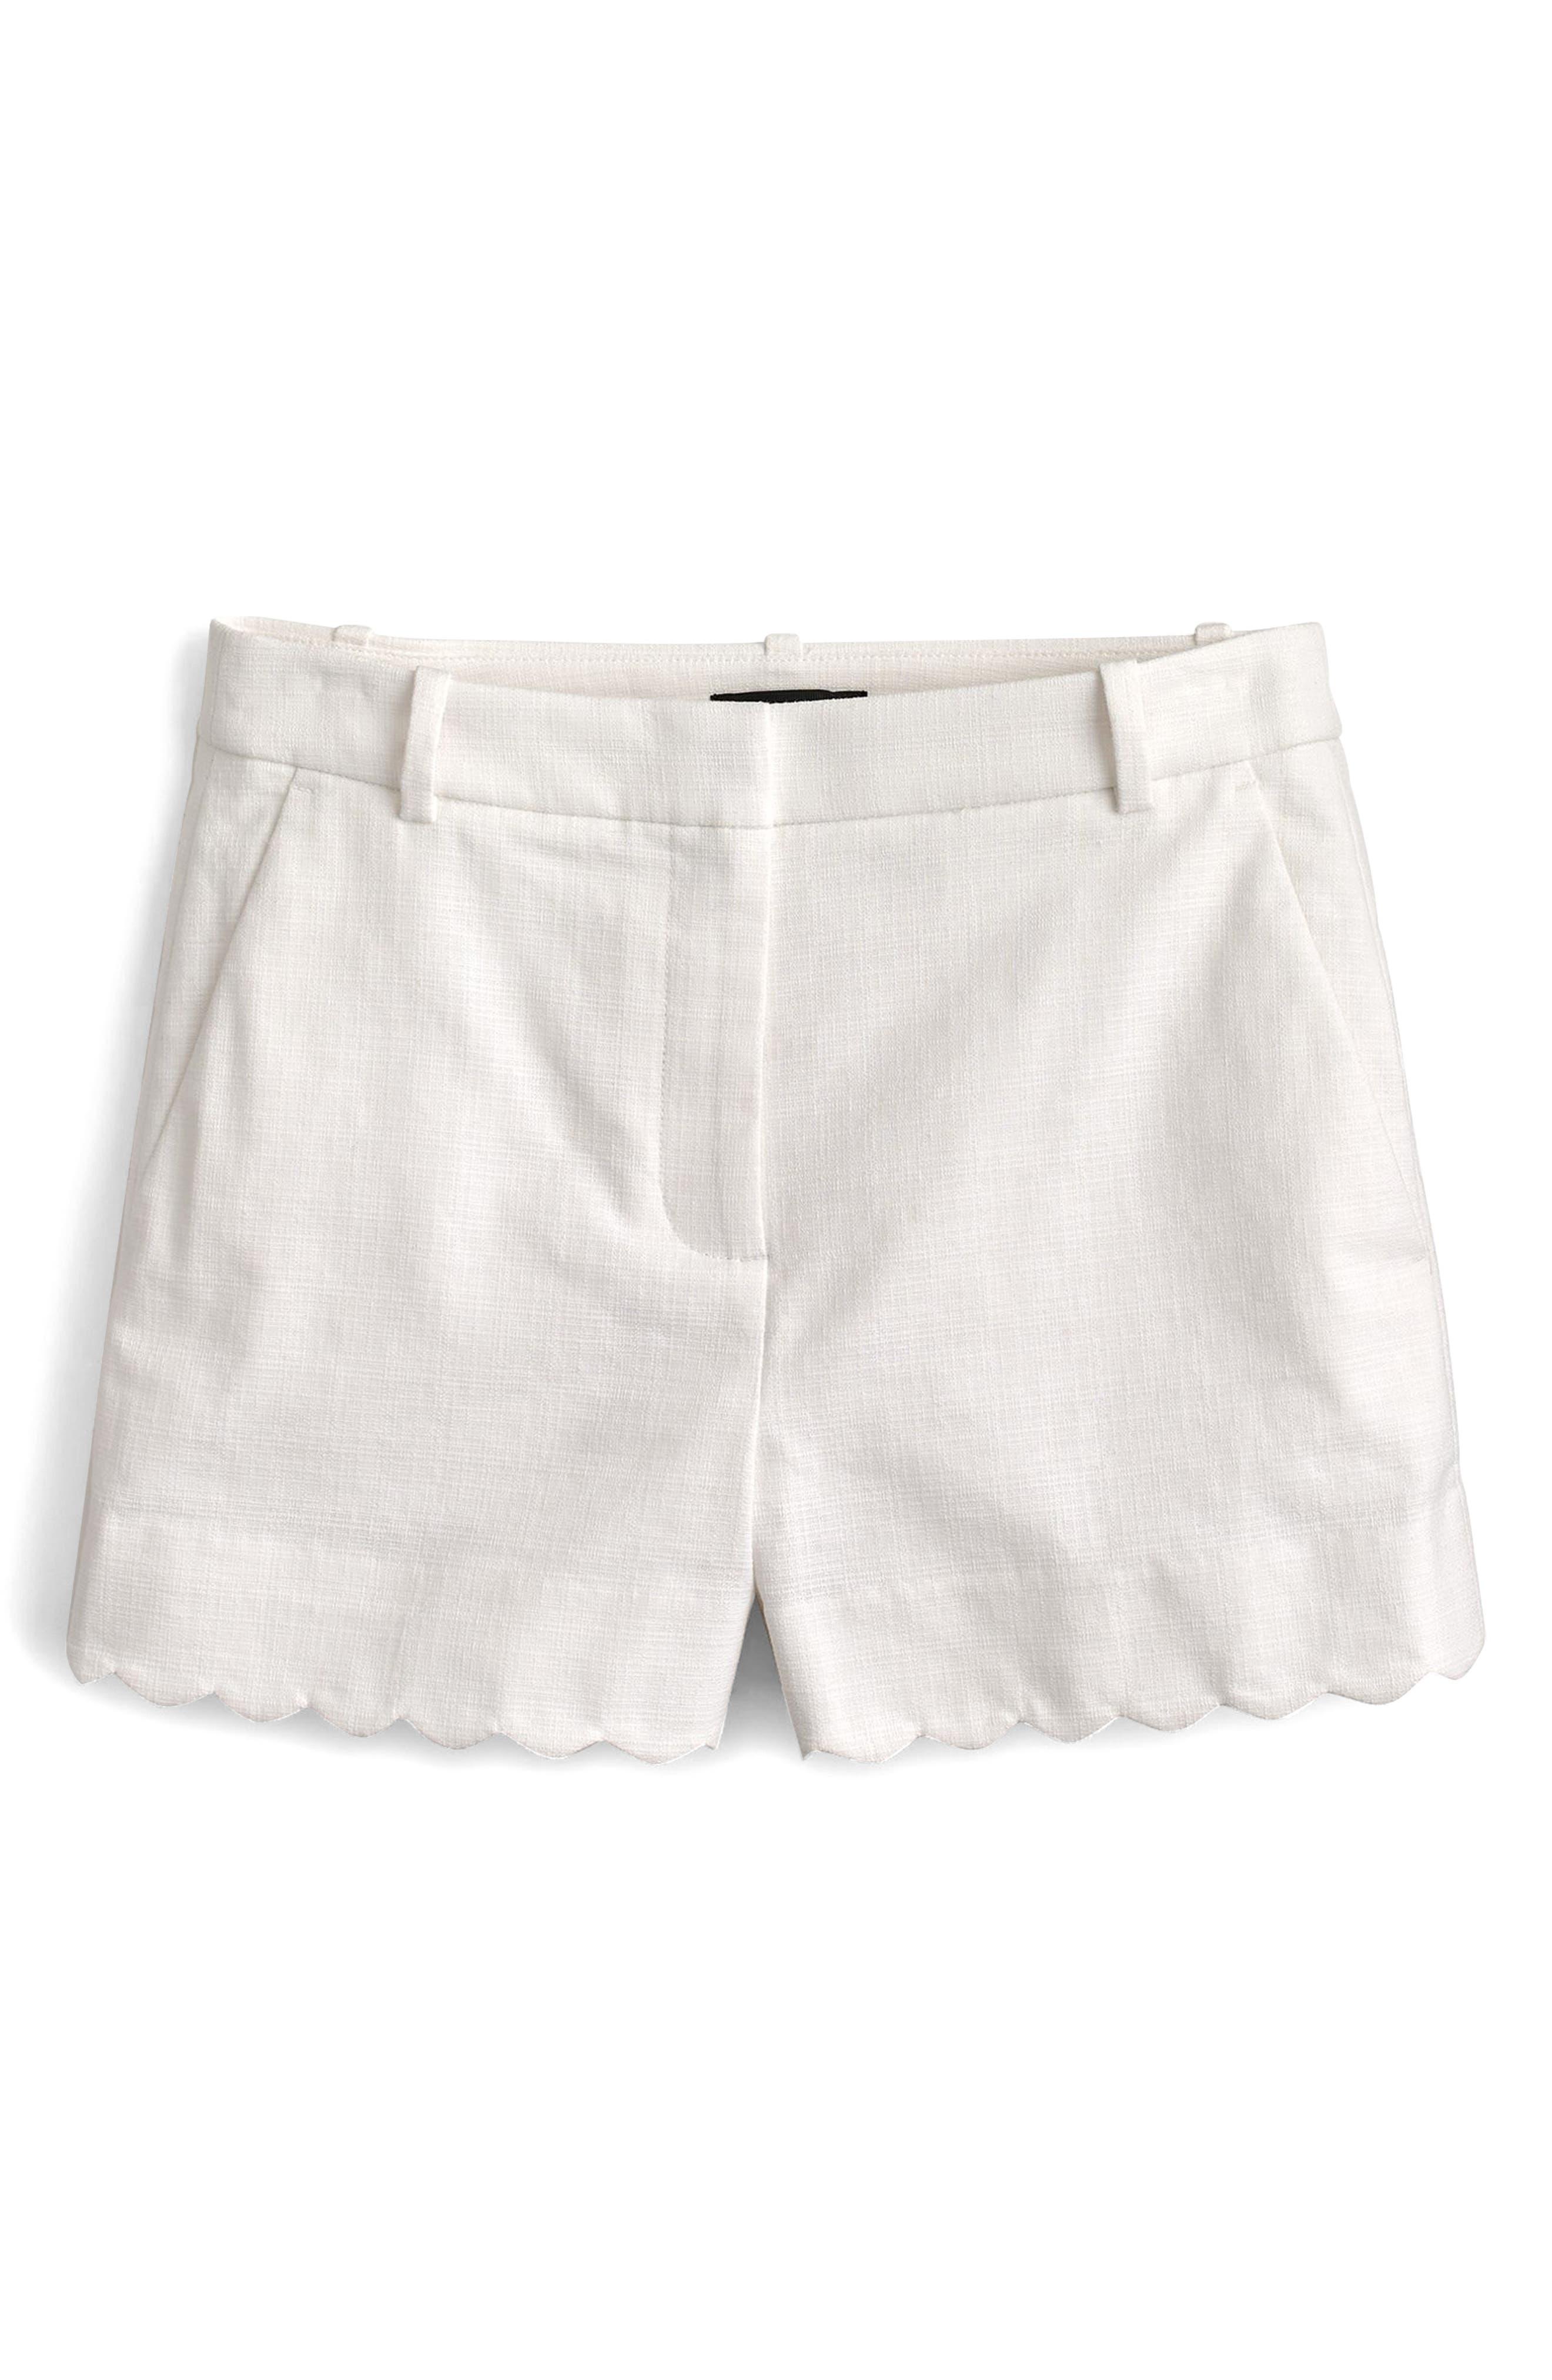 Fiesta Scallop Hem Stretch Cotton Shorts,                             Main thumbnail 2, color,